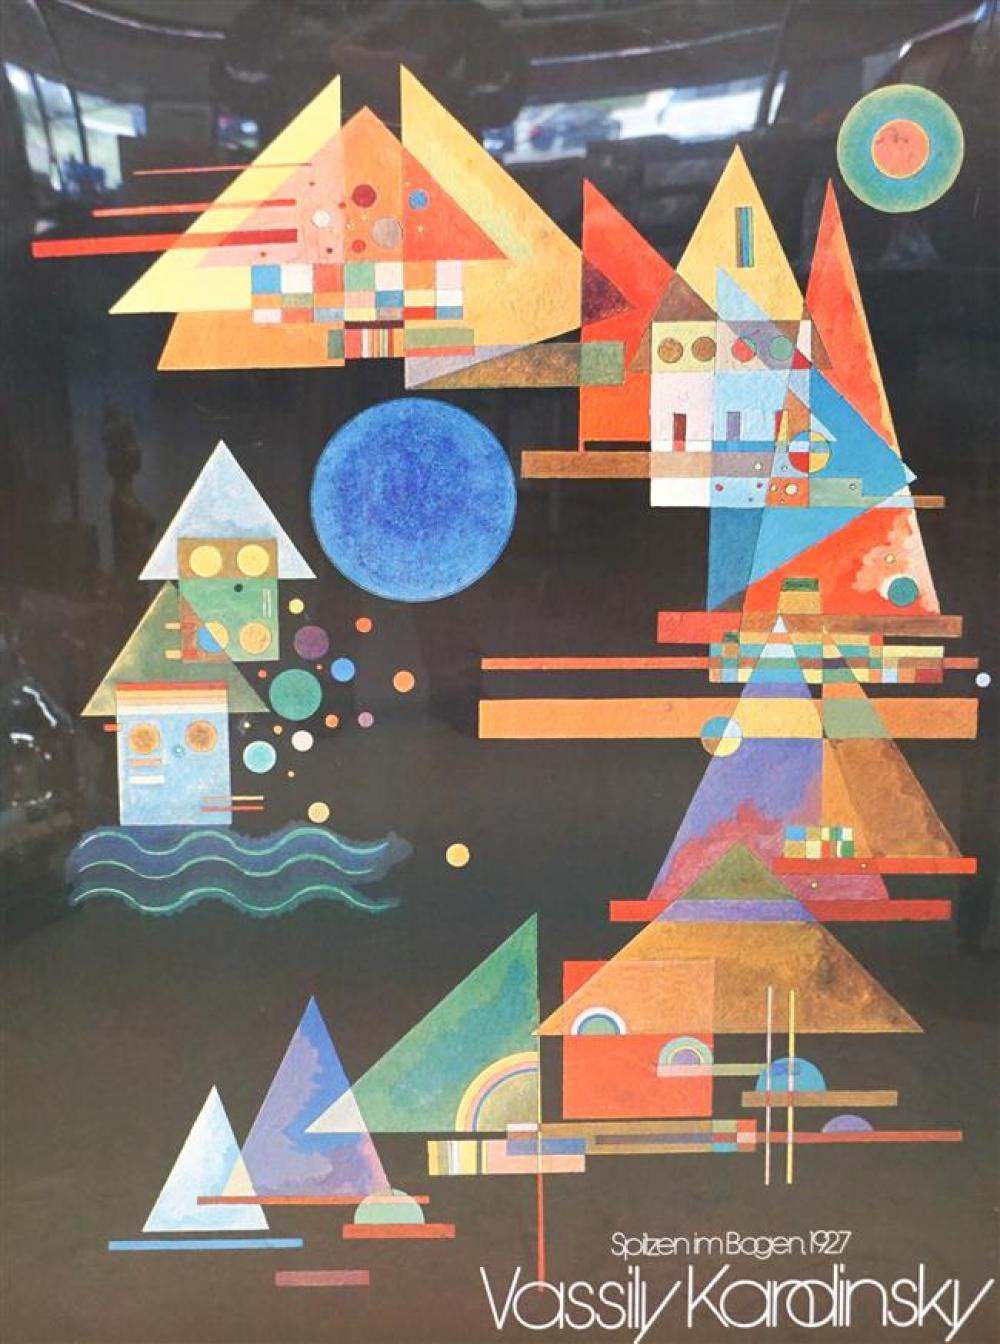 Vassily Kandinsky Color Poster, Frame: 48-1/2 x 36-1/2 in